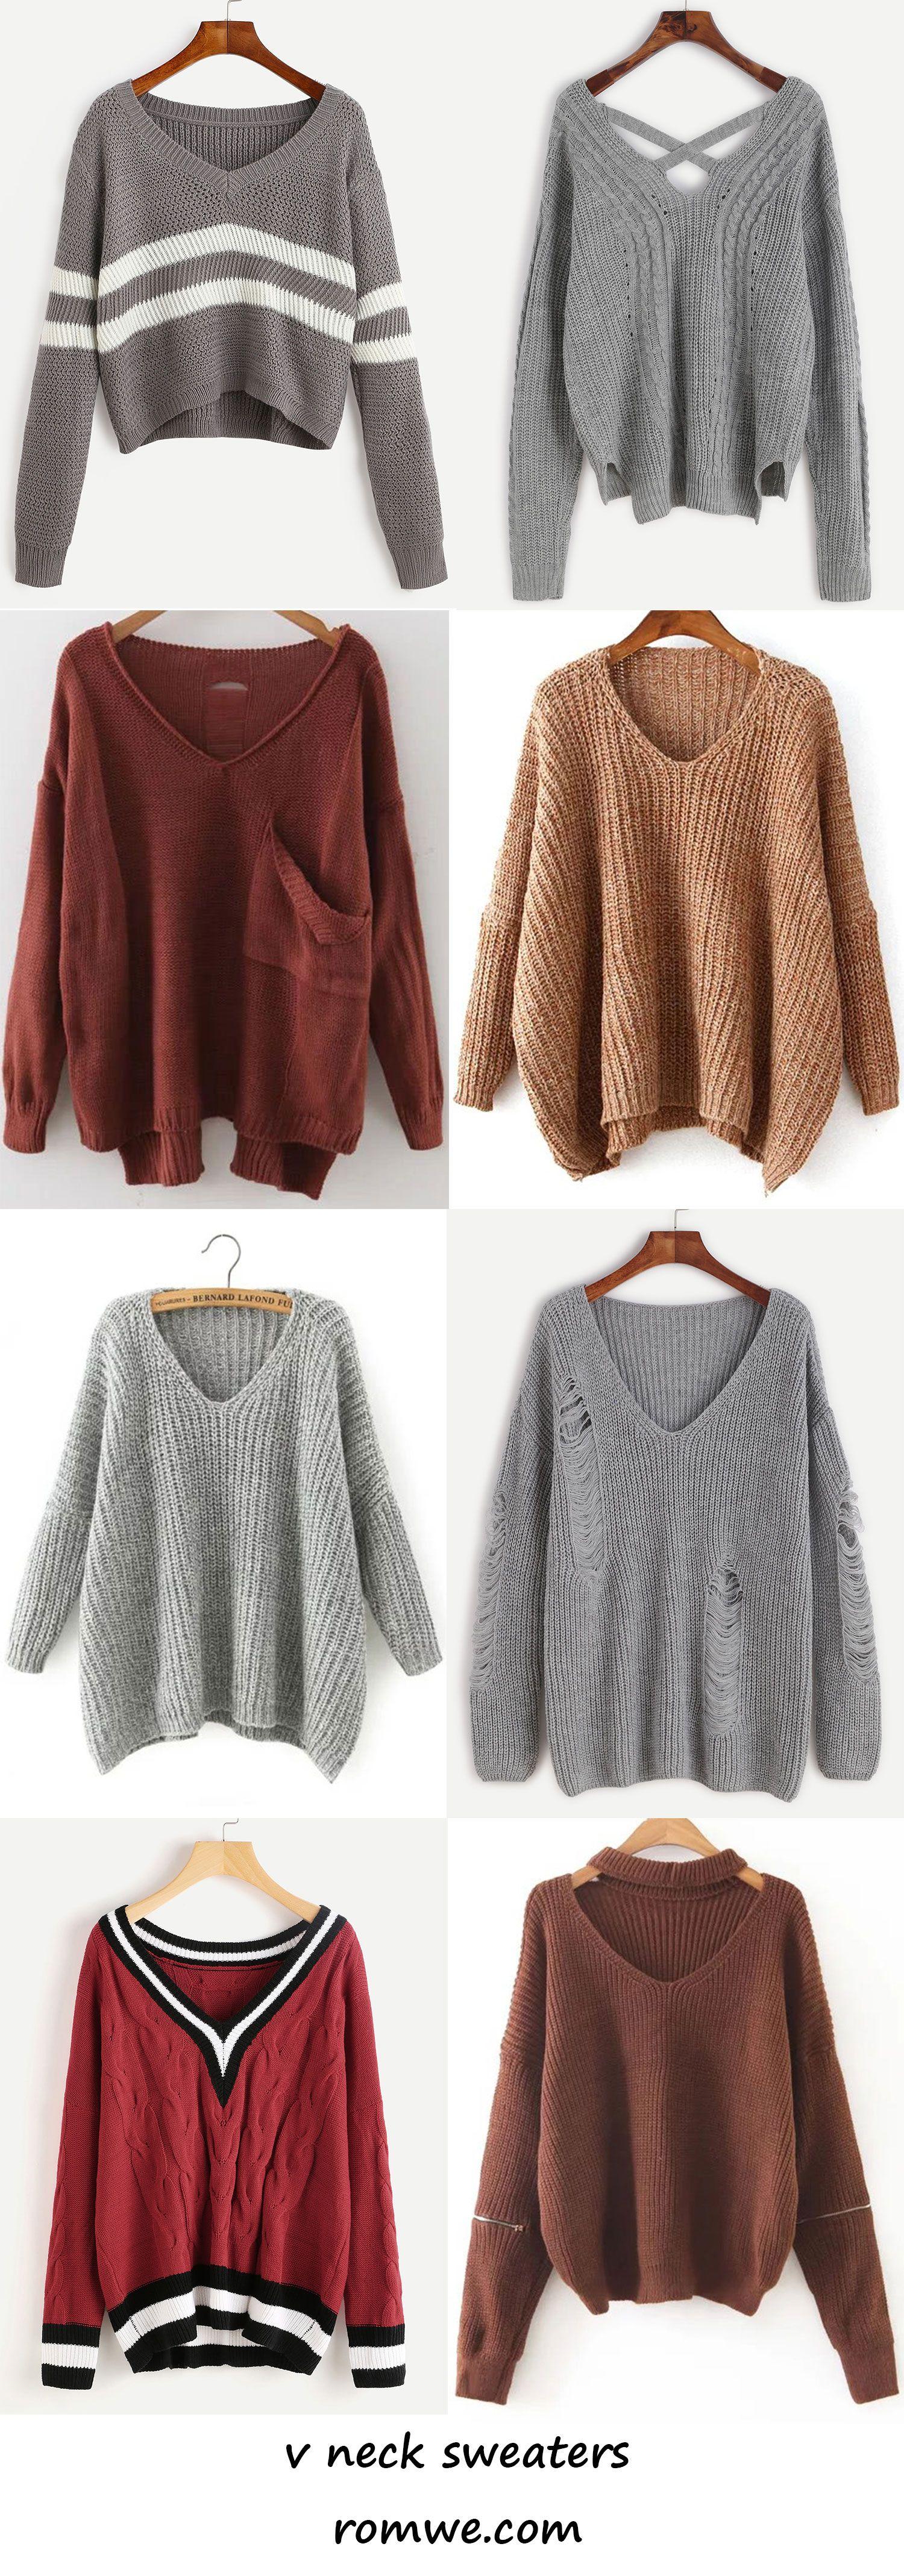 v neck sweaters 2017 - romwe.com | Romwe Women Style | Pinterest ...